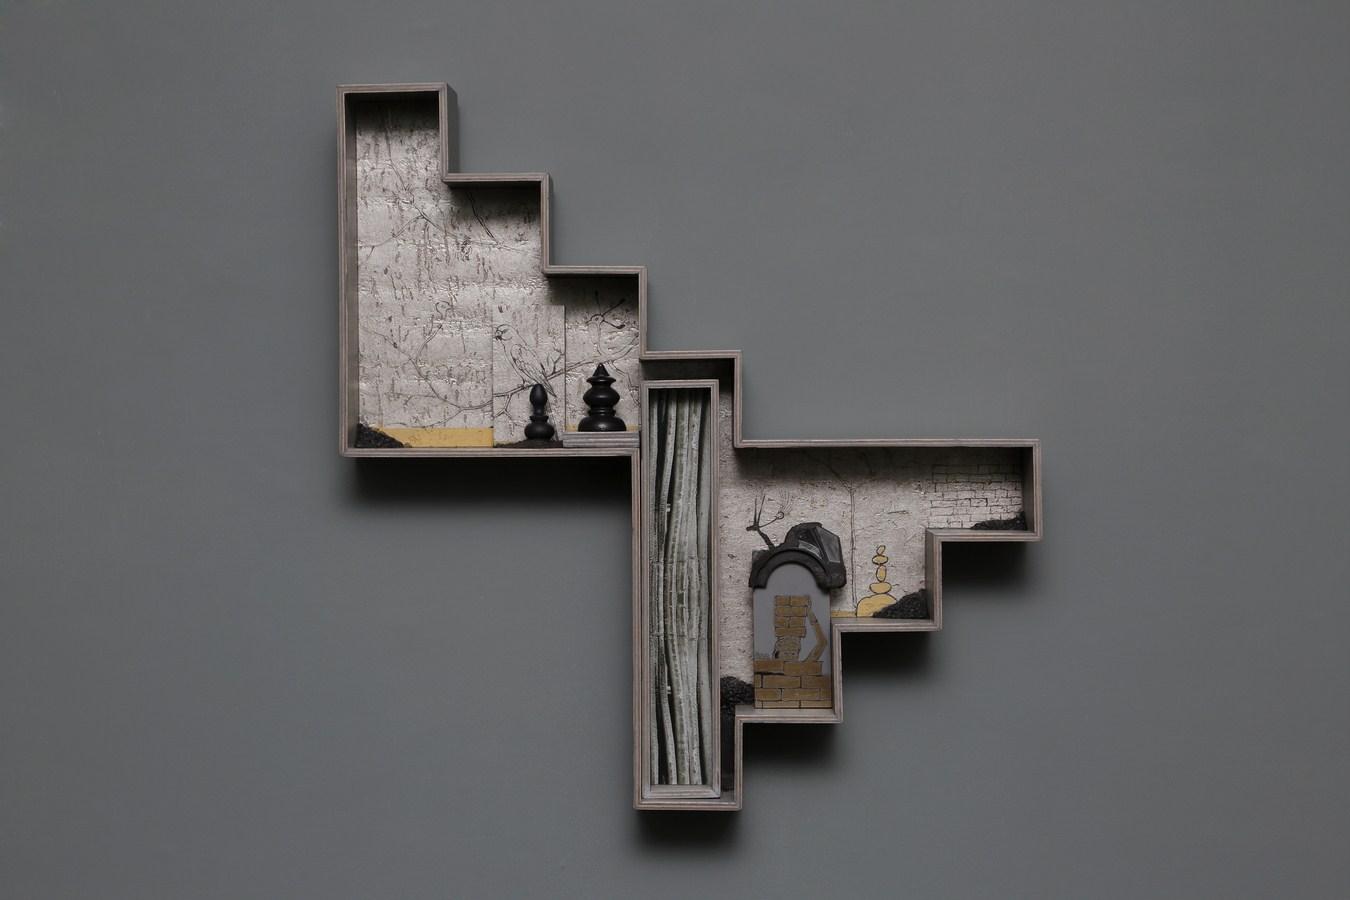 "Dweller of Metropolis - X | Paper Mache, photograph, plywood, wood, acrylic, wallpaper, auto paint | 22.5"" x 21.5"" | 2017"